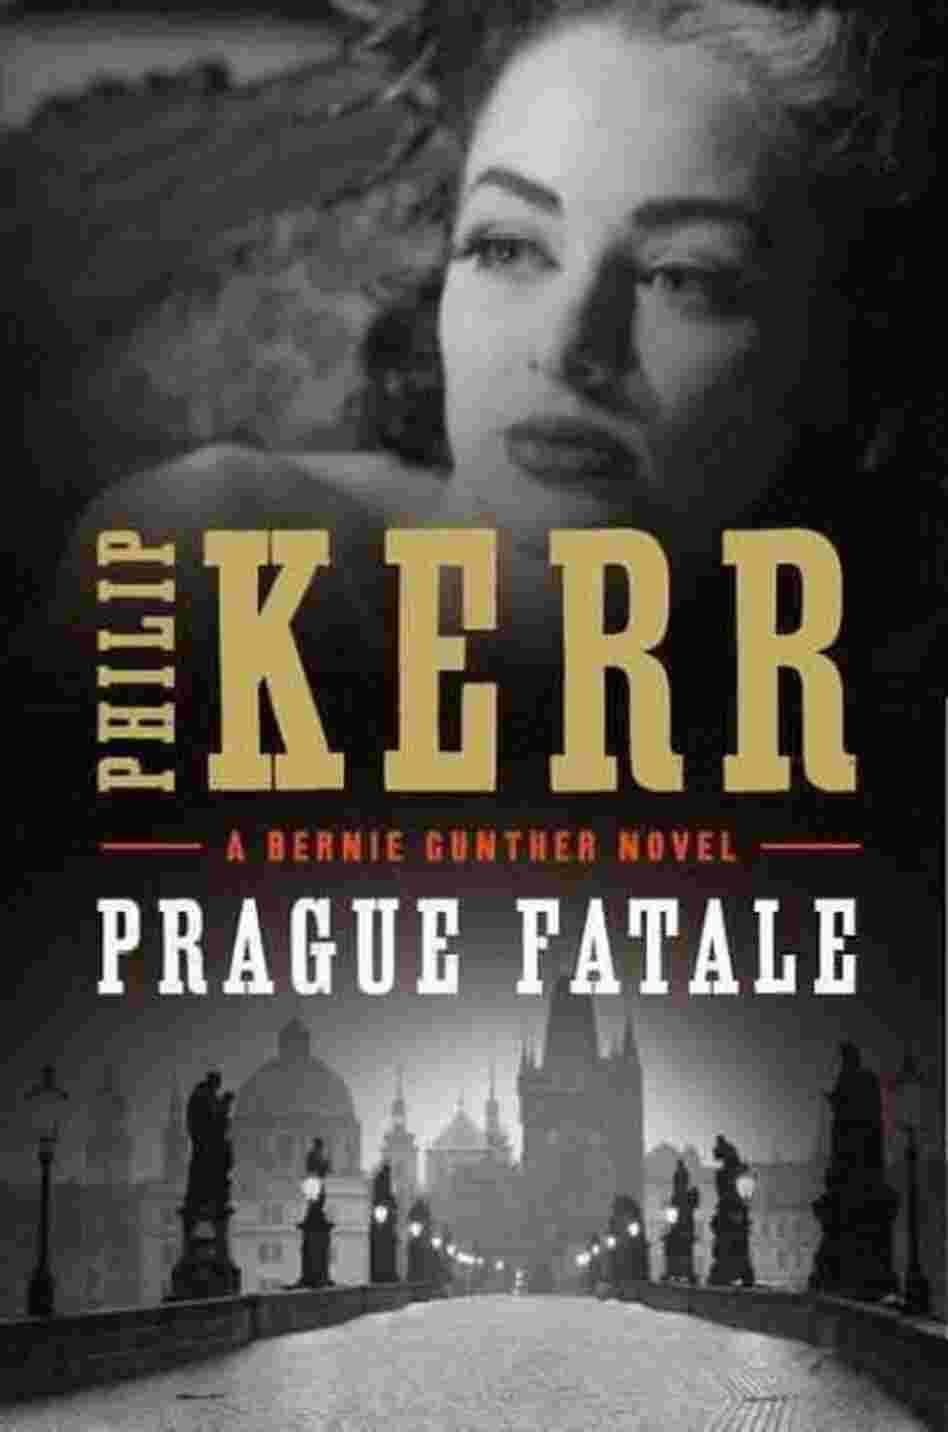 Prague Fatale (Bernie Gunther) Philip Kerr